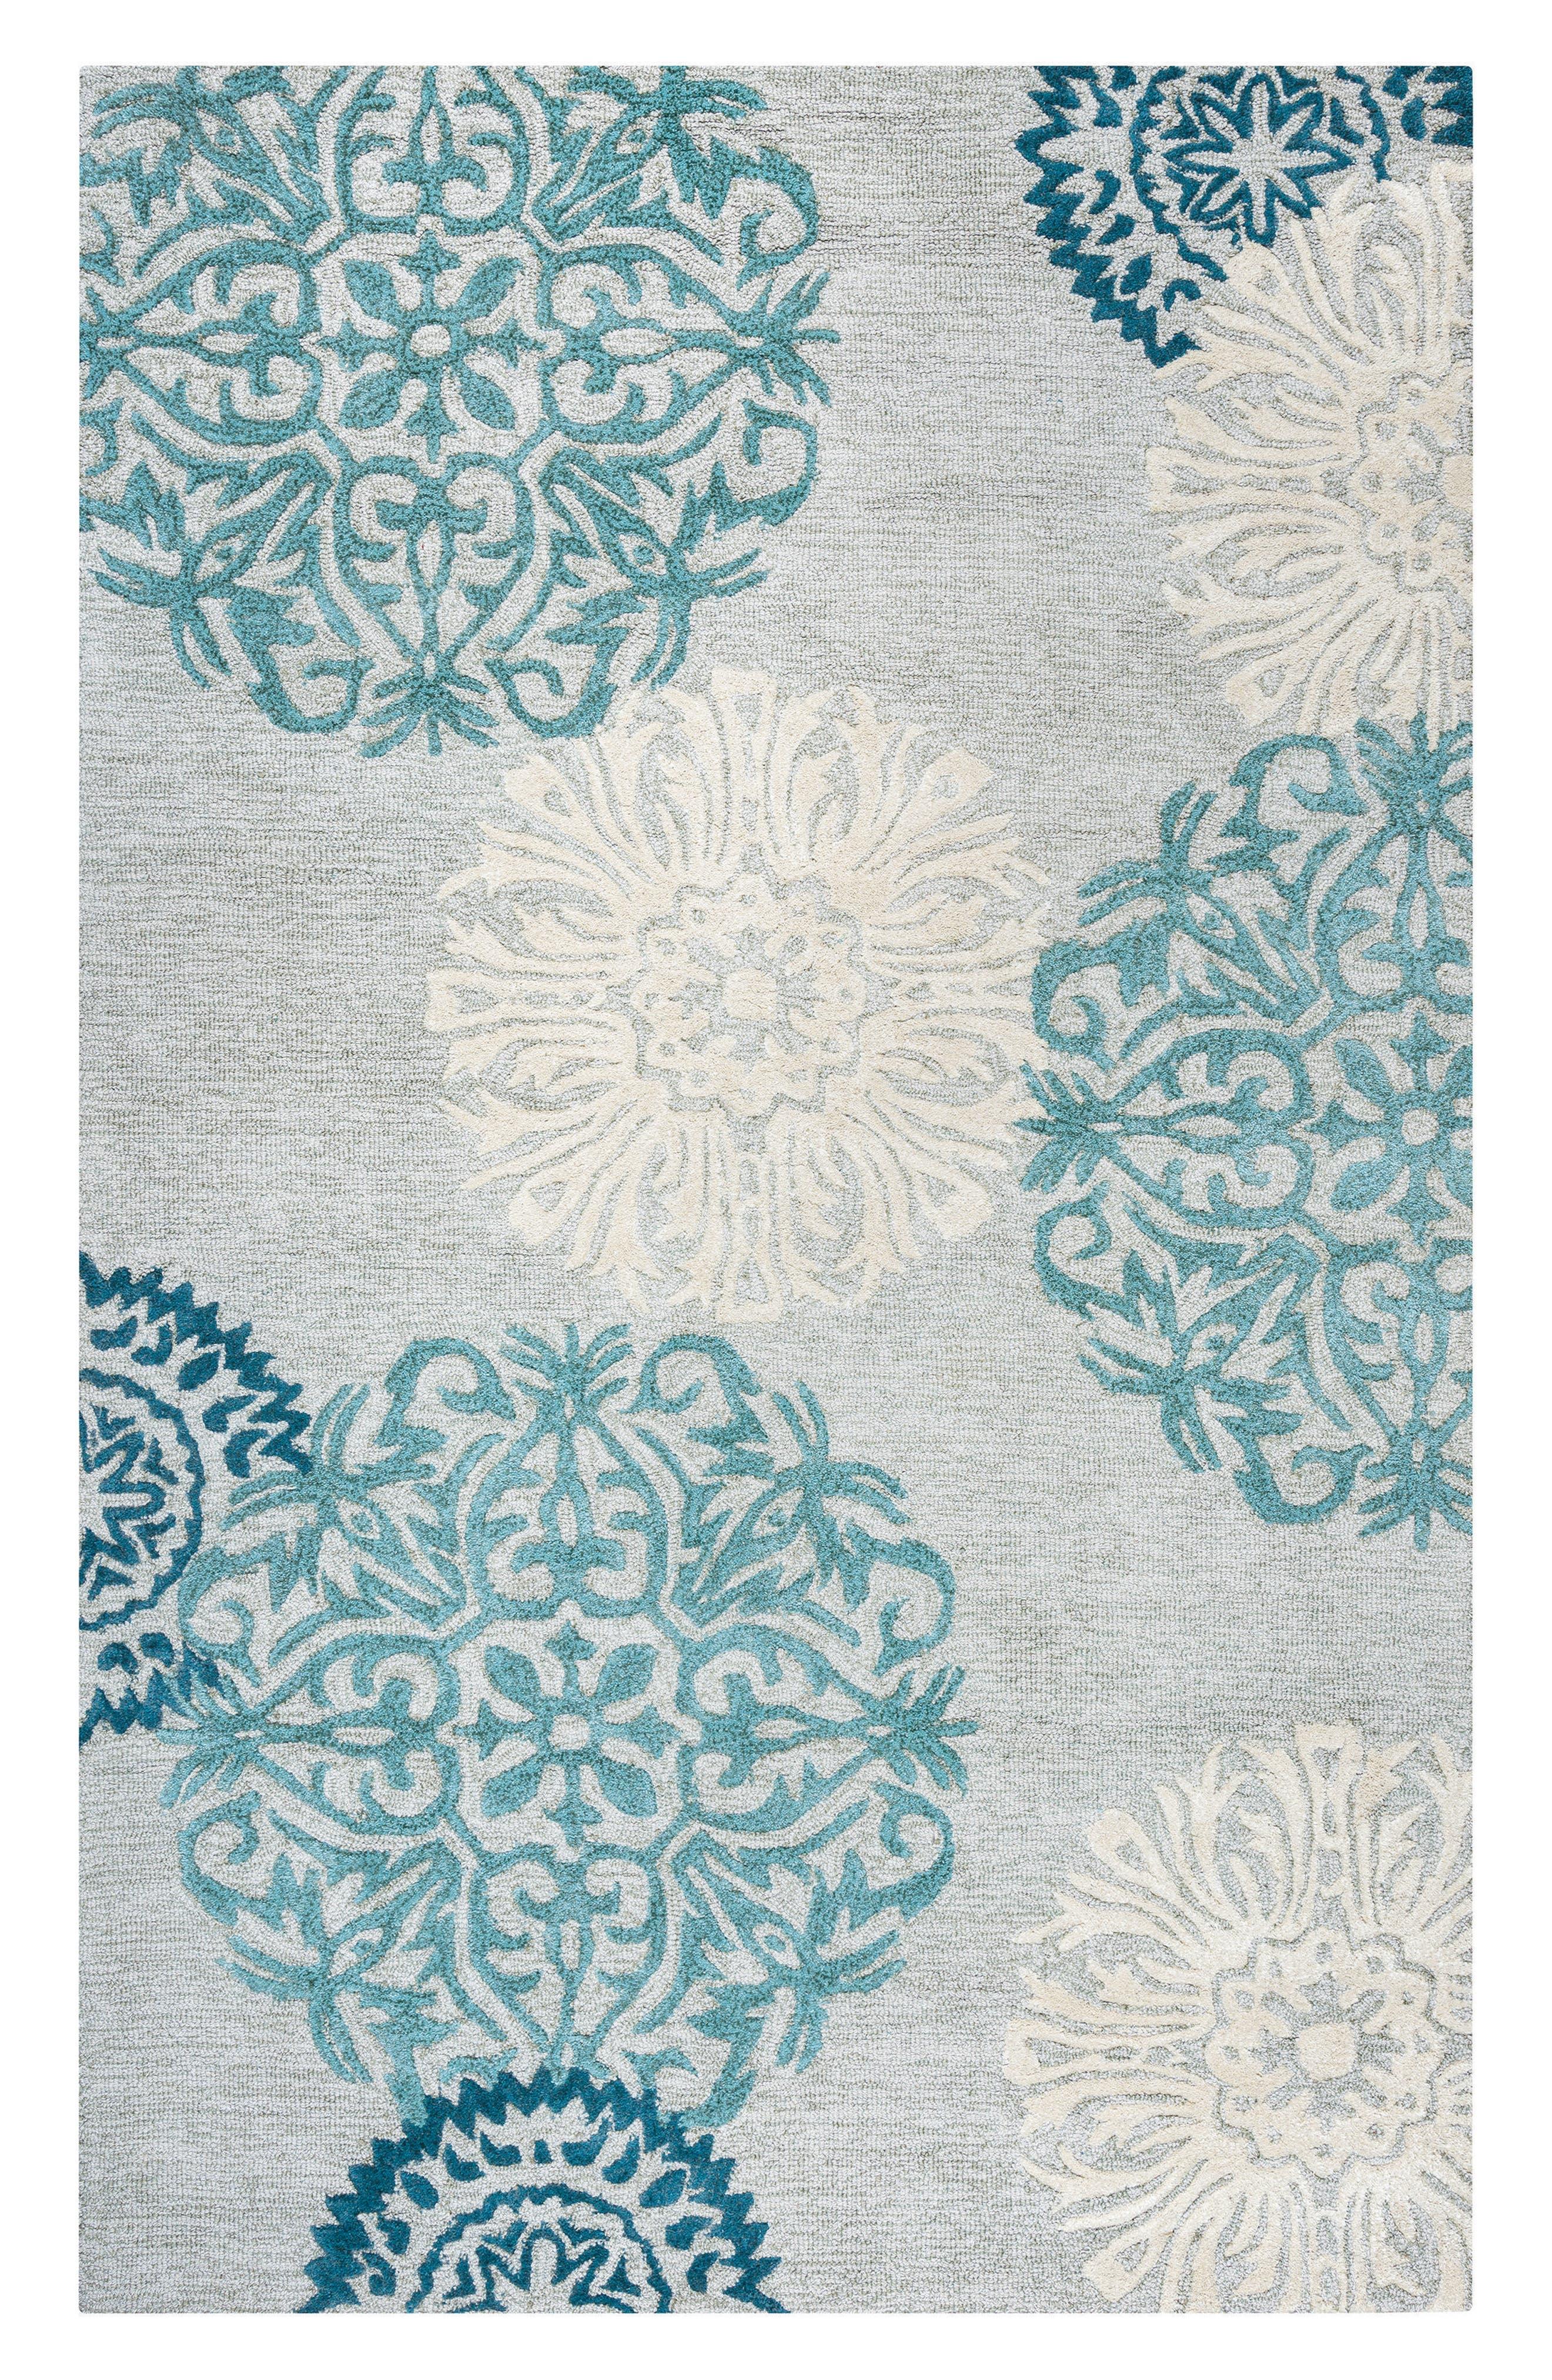 'Dimensional' Wool Area Rug,                             Main thumbnail 1, color,